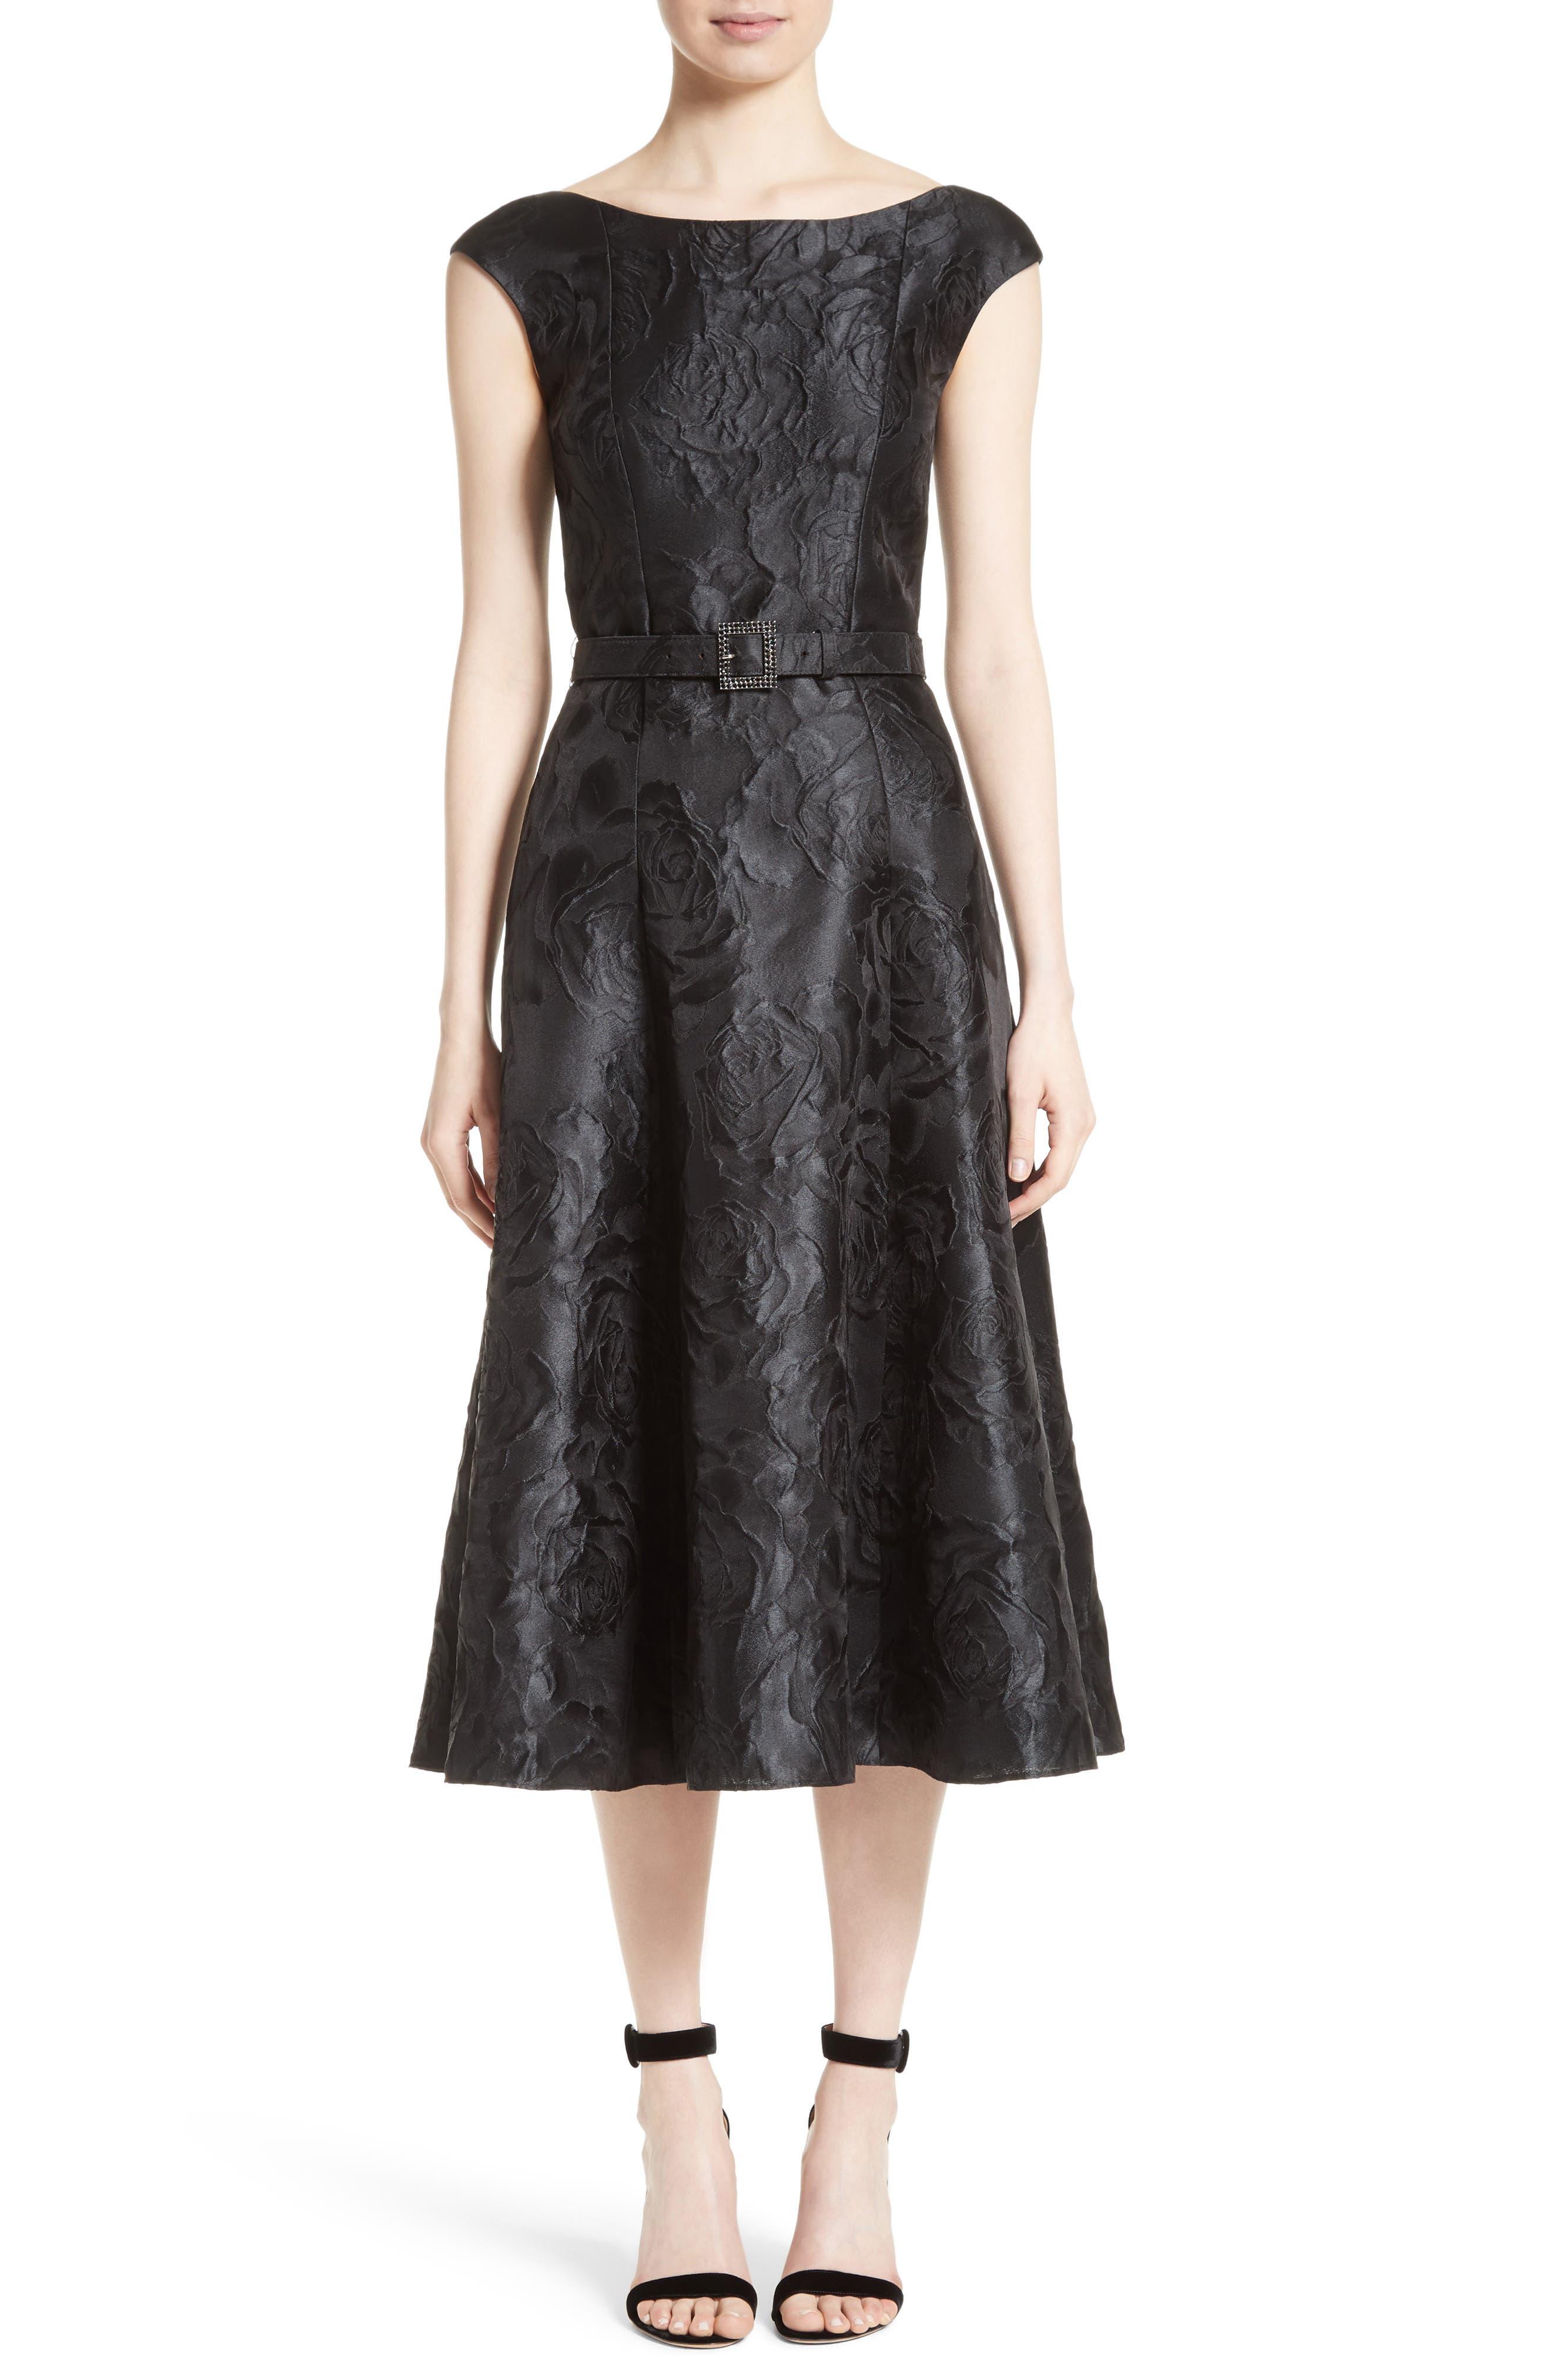 St. John Collection Avani Rose Jacquard Dress